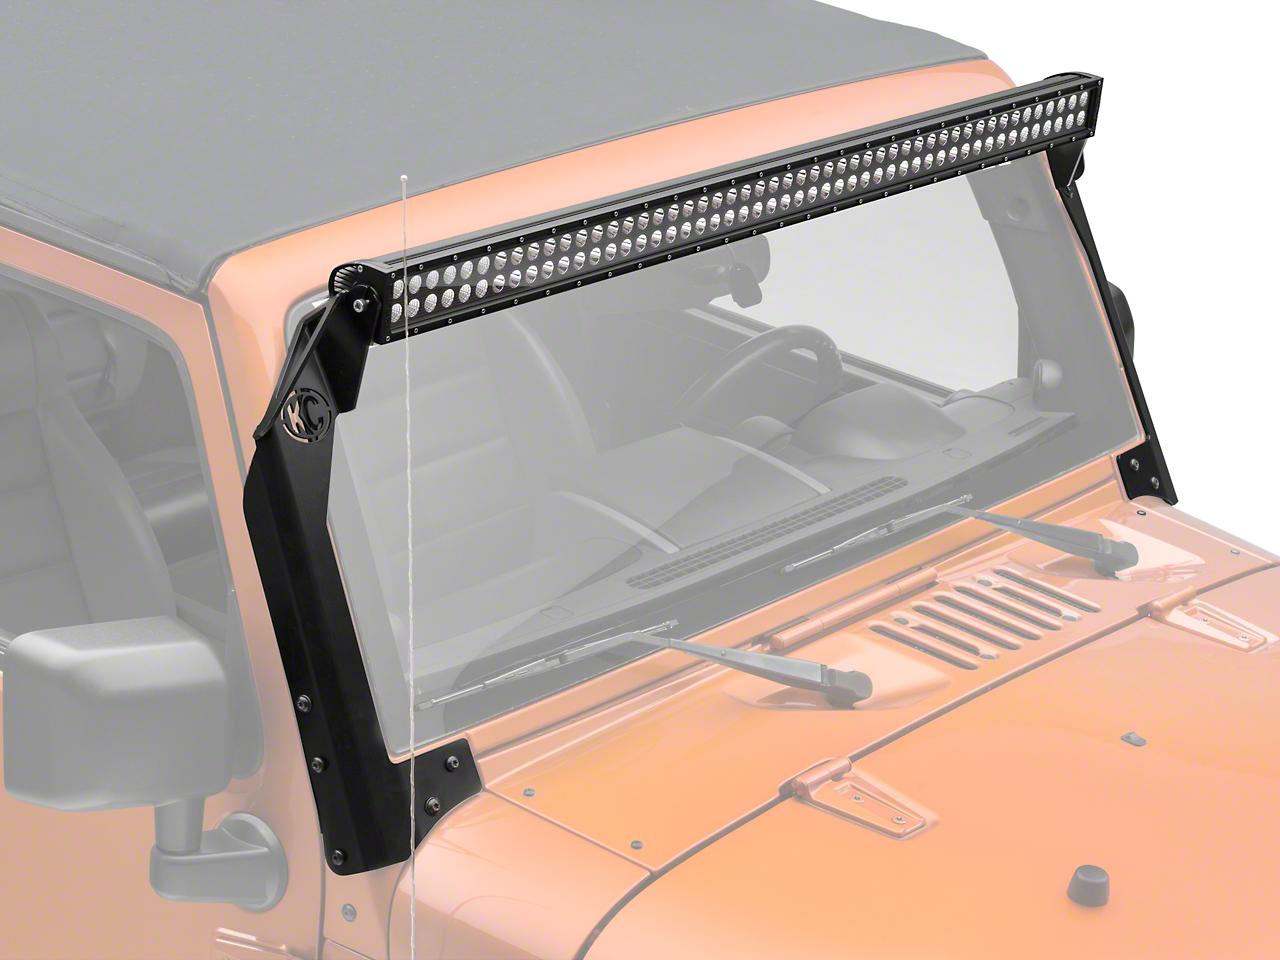 KC HiLiTES 50 in. C-Series C50 LED Light Bar w/ Overhead Mounting Brackets (07-17 Wrangler JK)